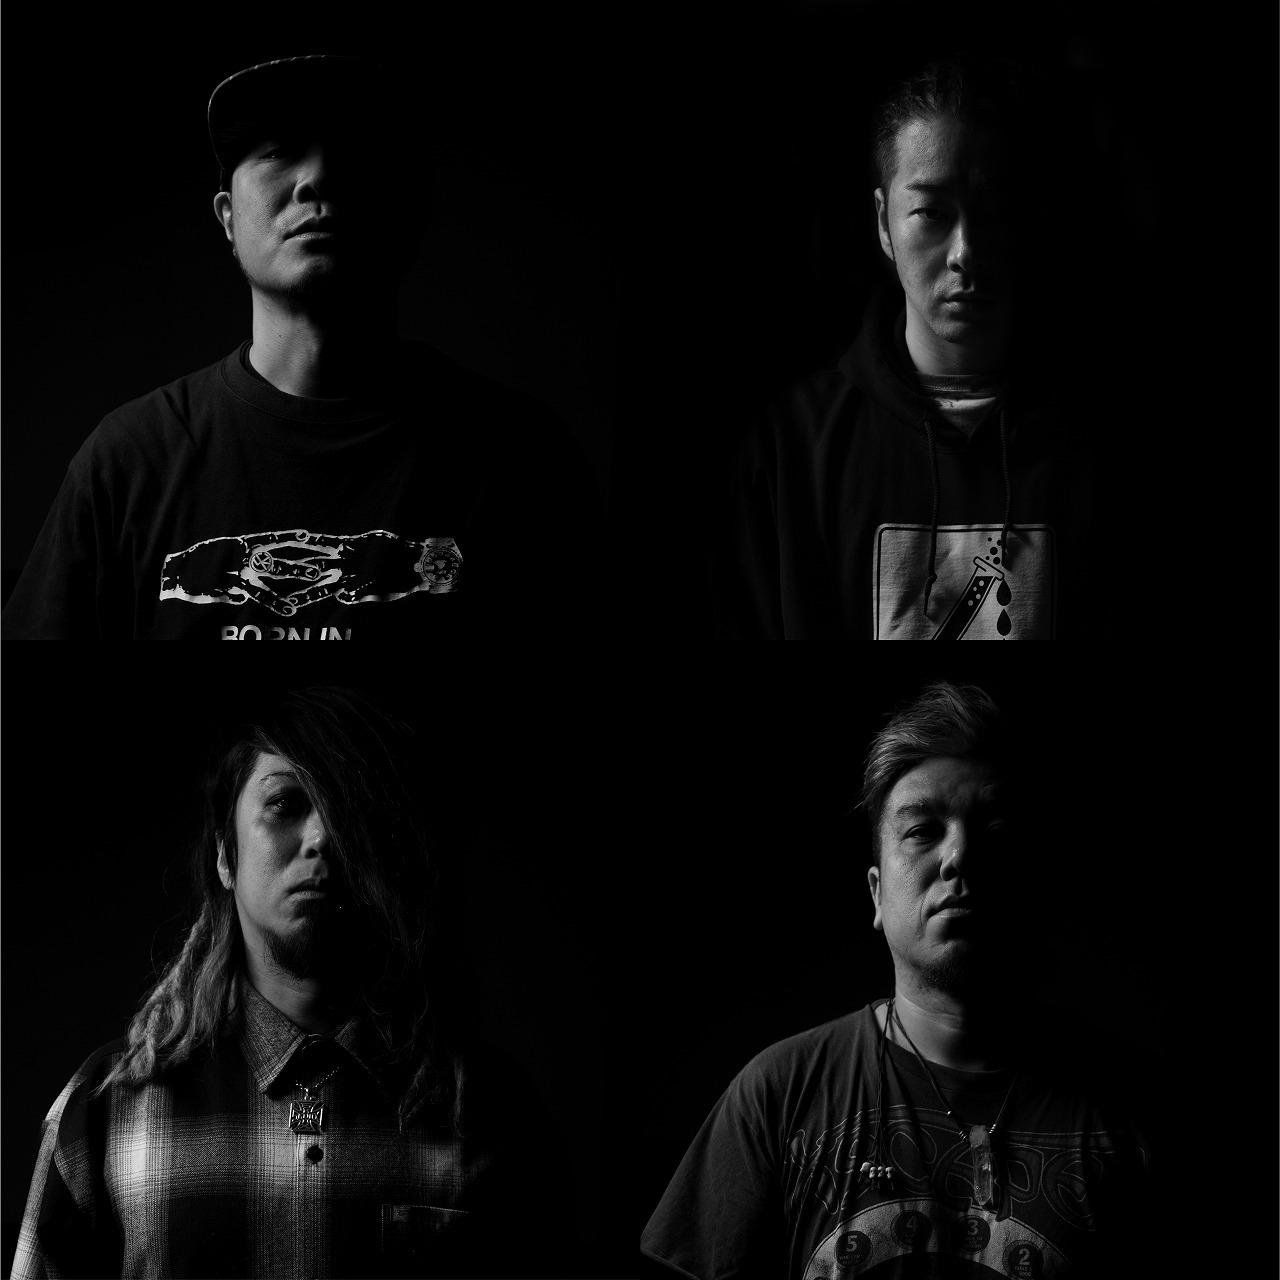 KYONO BAND 写真上(左→右)KYONO、MIYA。下(左→右)HIROMITSU、DUTTCH